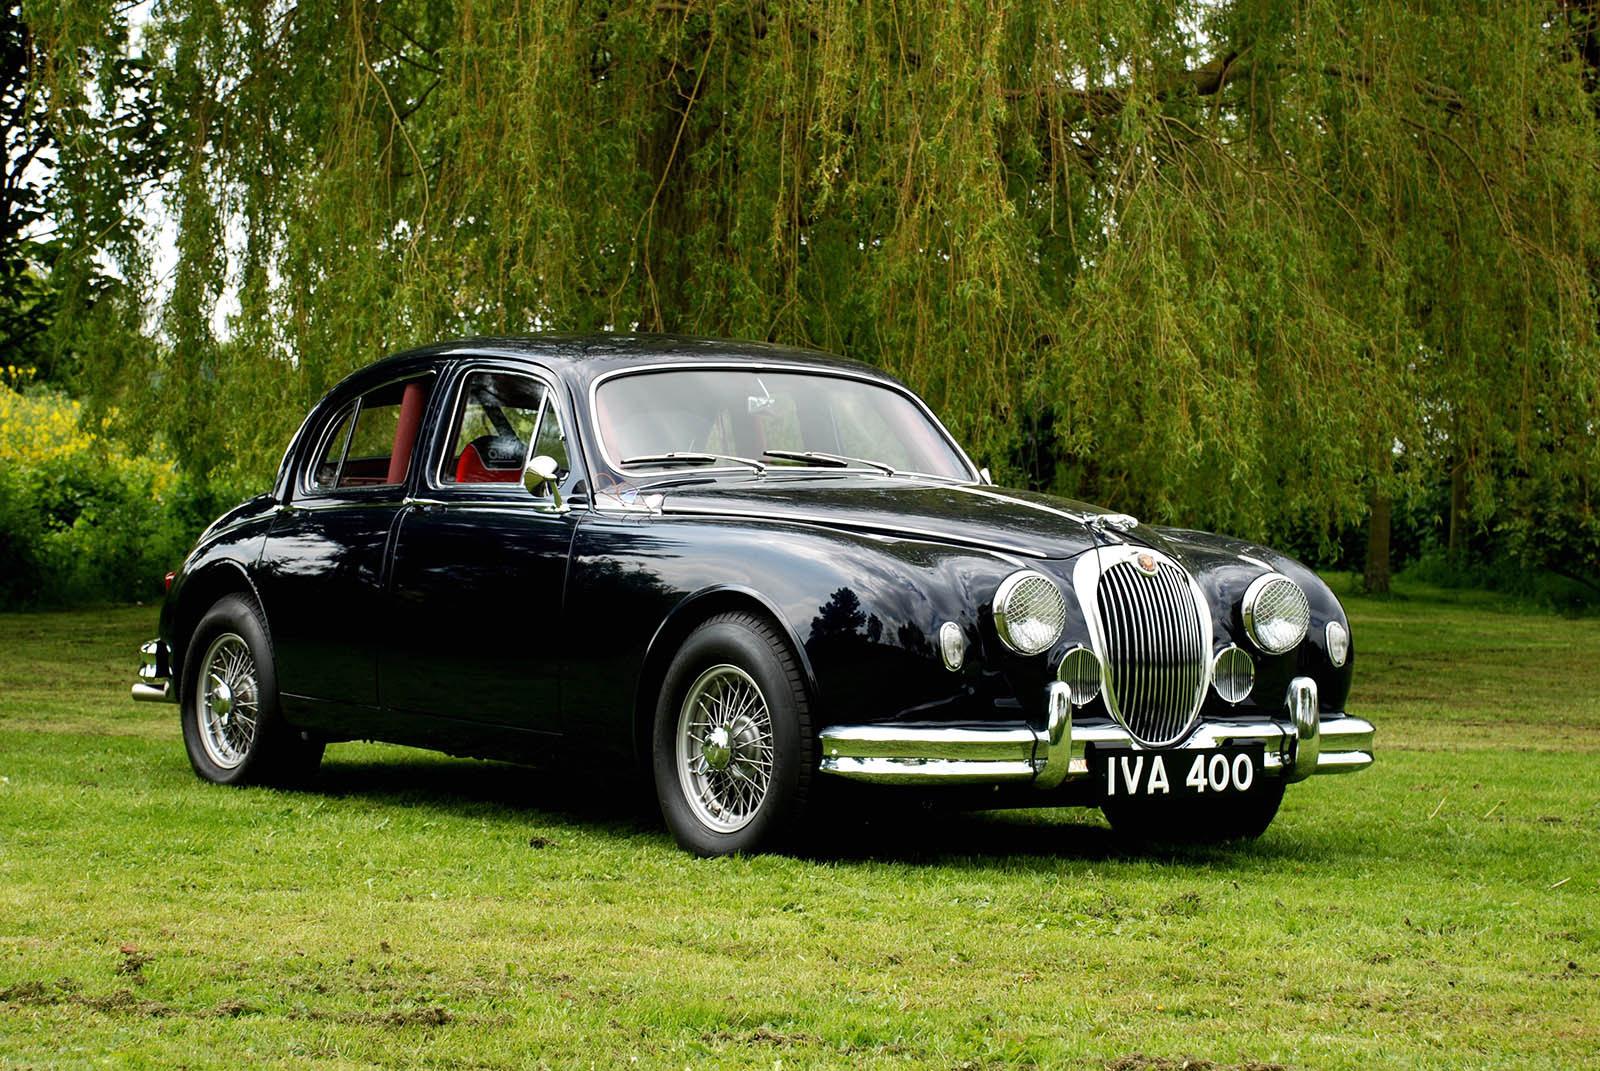 1959 bscc_Jaguar_competition_mk I_sayer selection_scragg_wilkinson_iva400_web_16.jpg